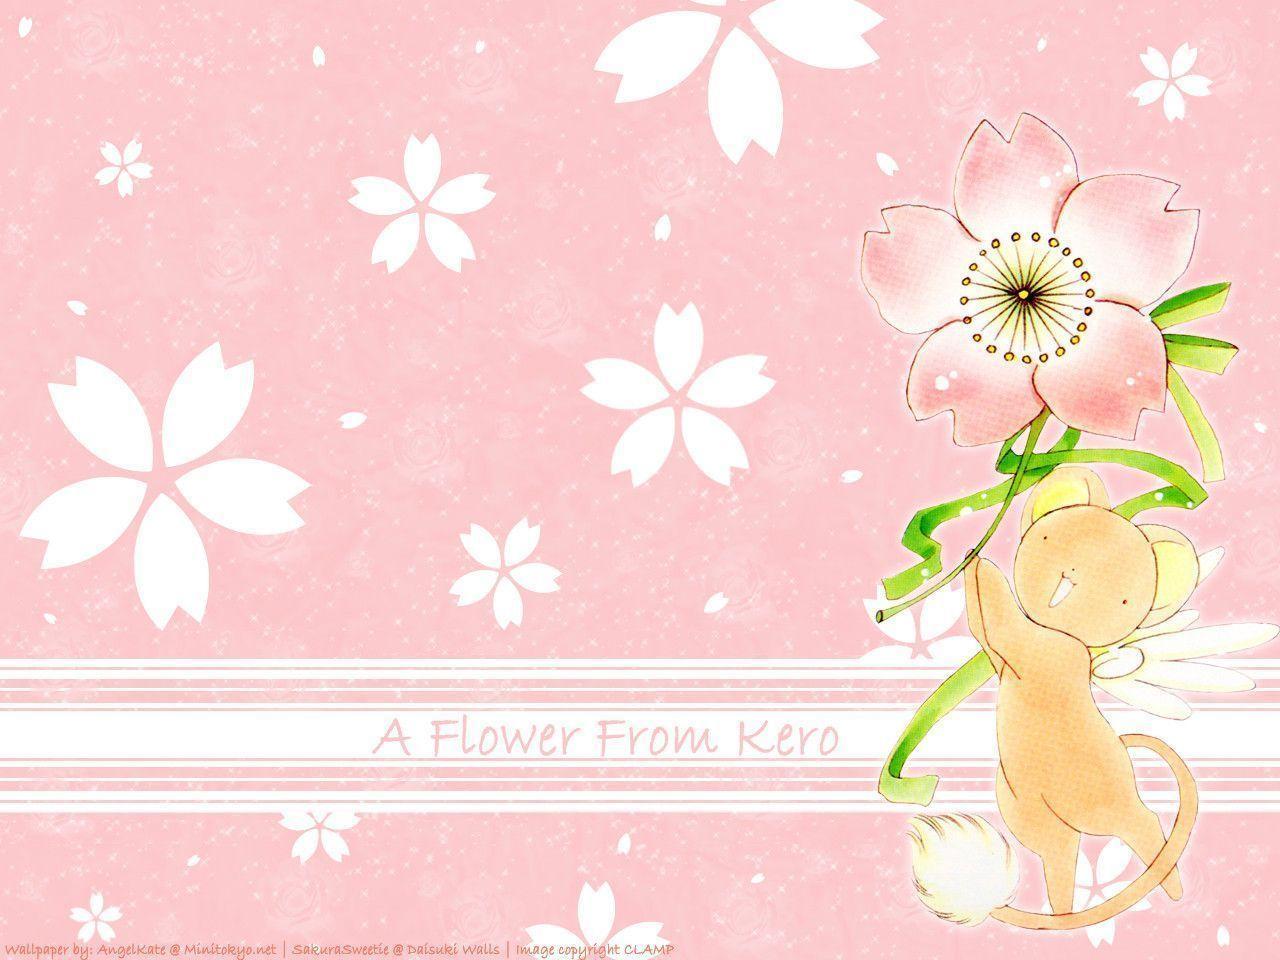 A flower from Kero - Cardcaptor Sakura Wallpaper (5022194) - Fanpop